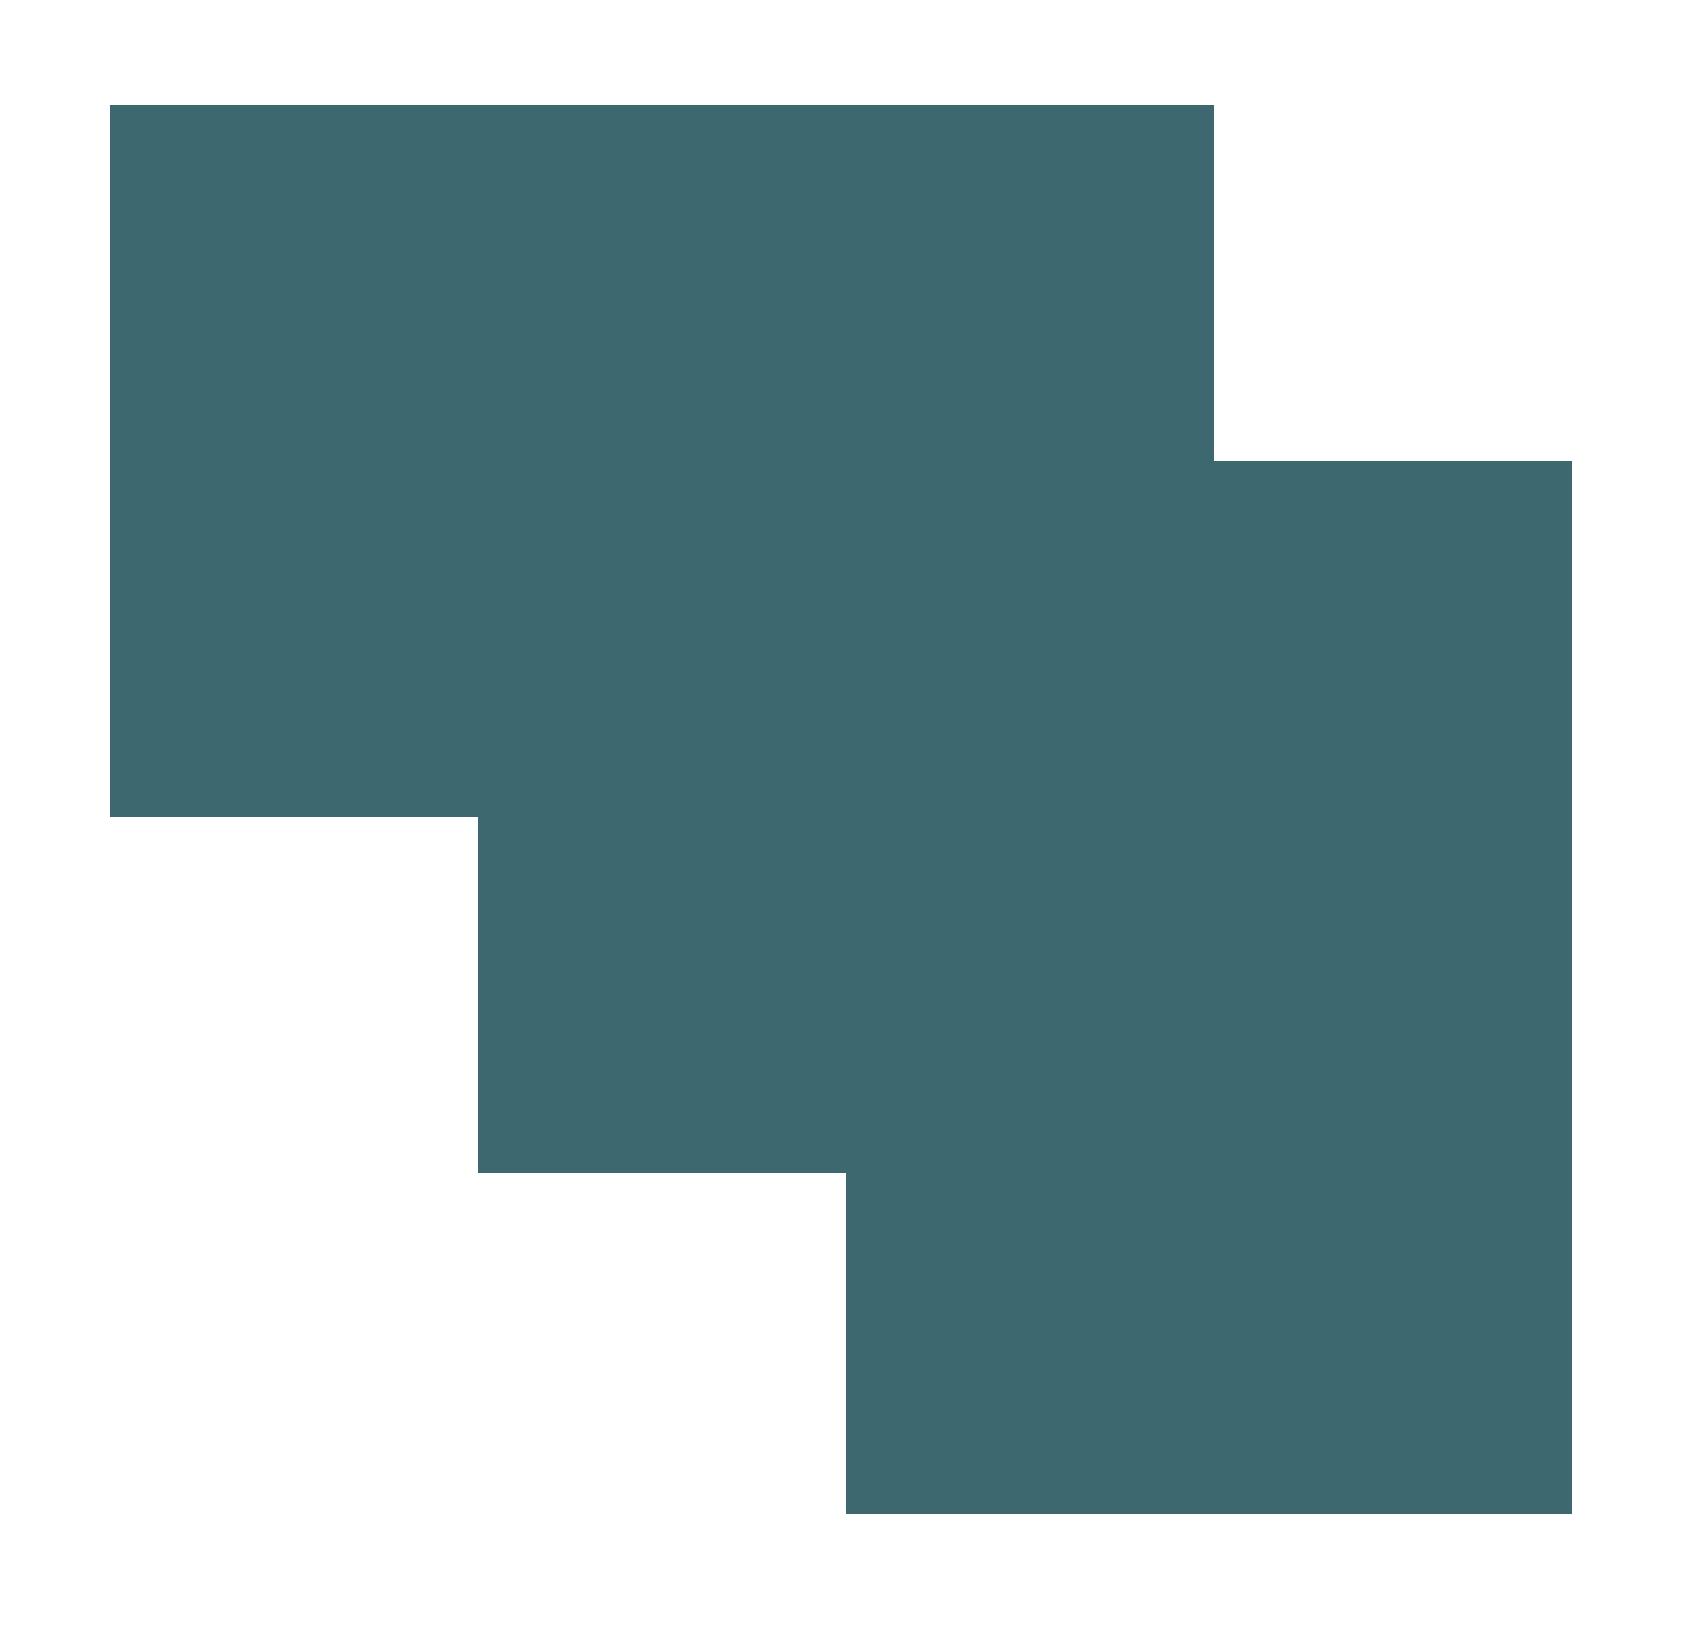 COPYRIGHT © 2017 MEG & JOHN REAL ESTATE